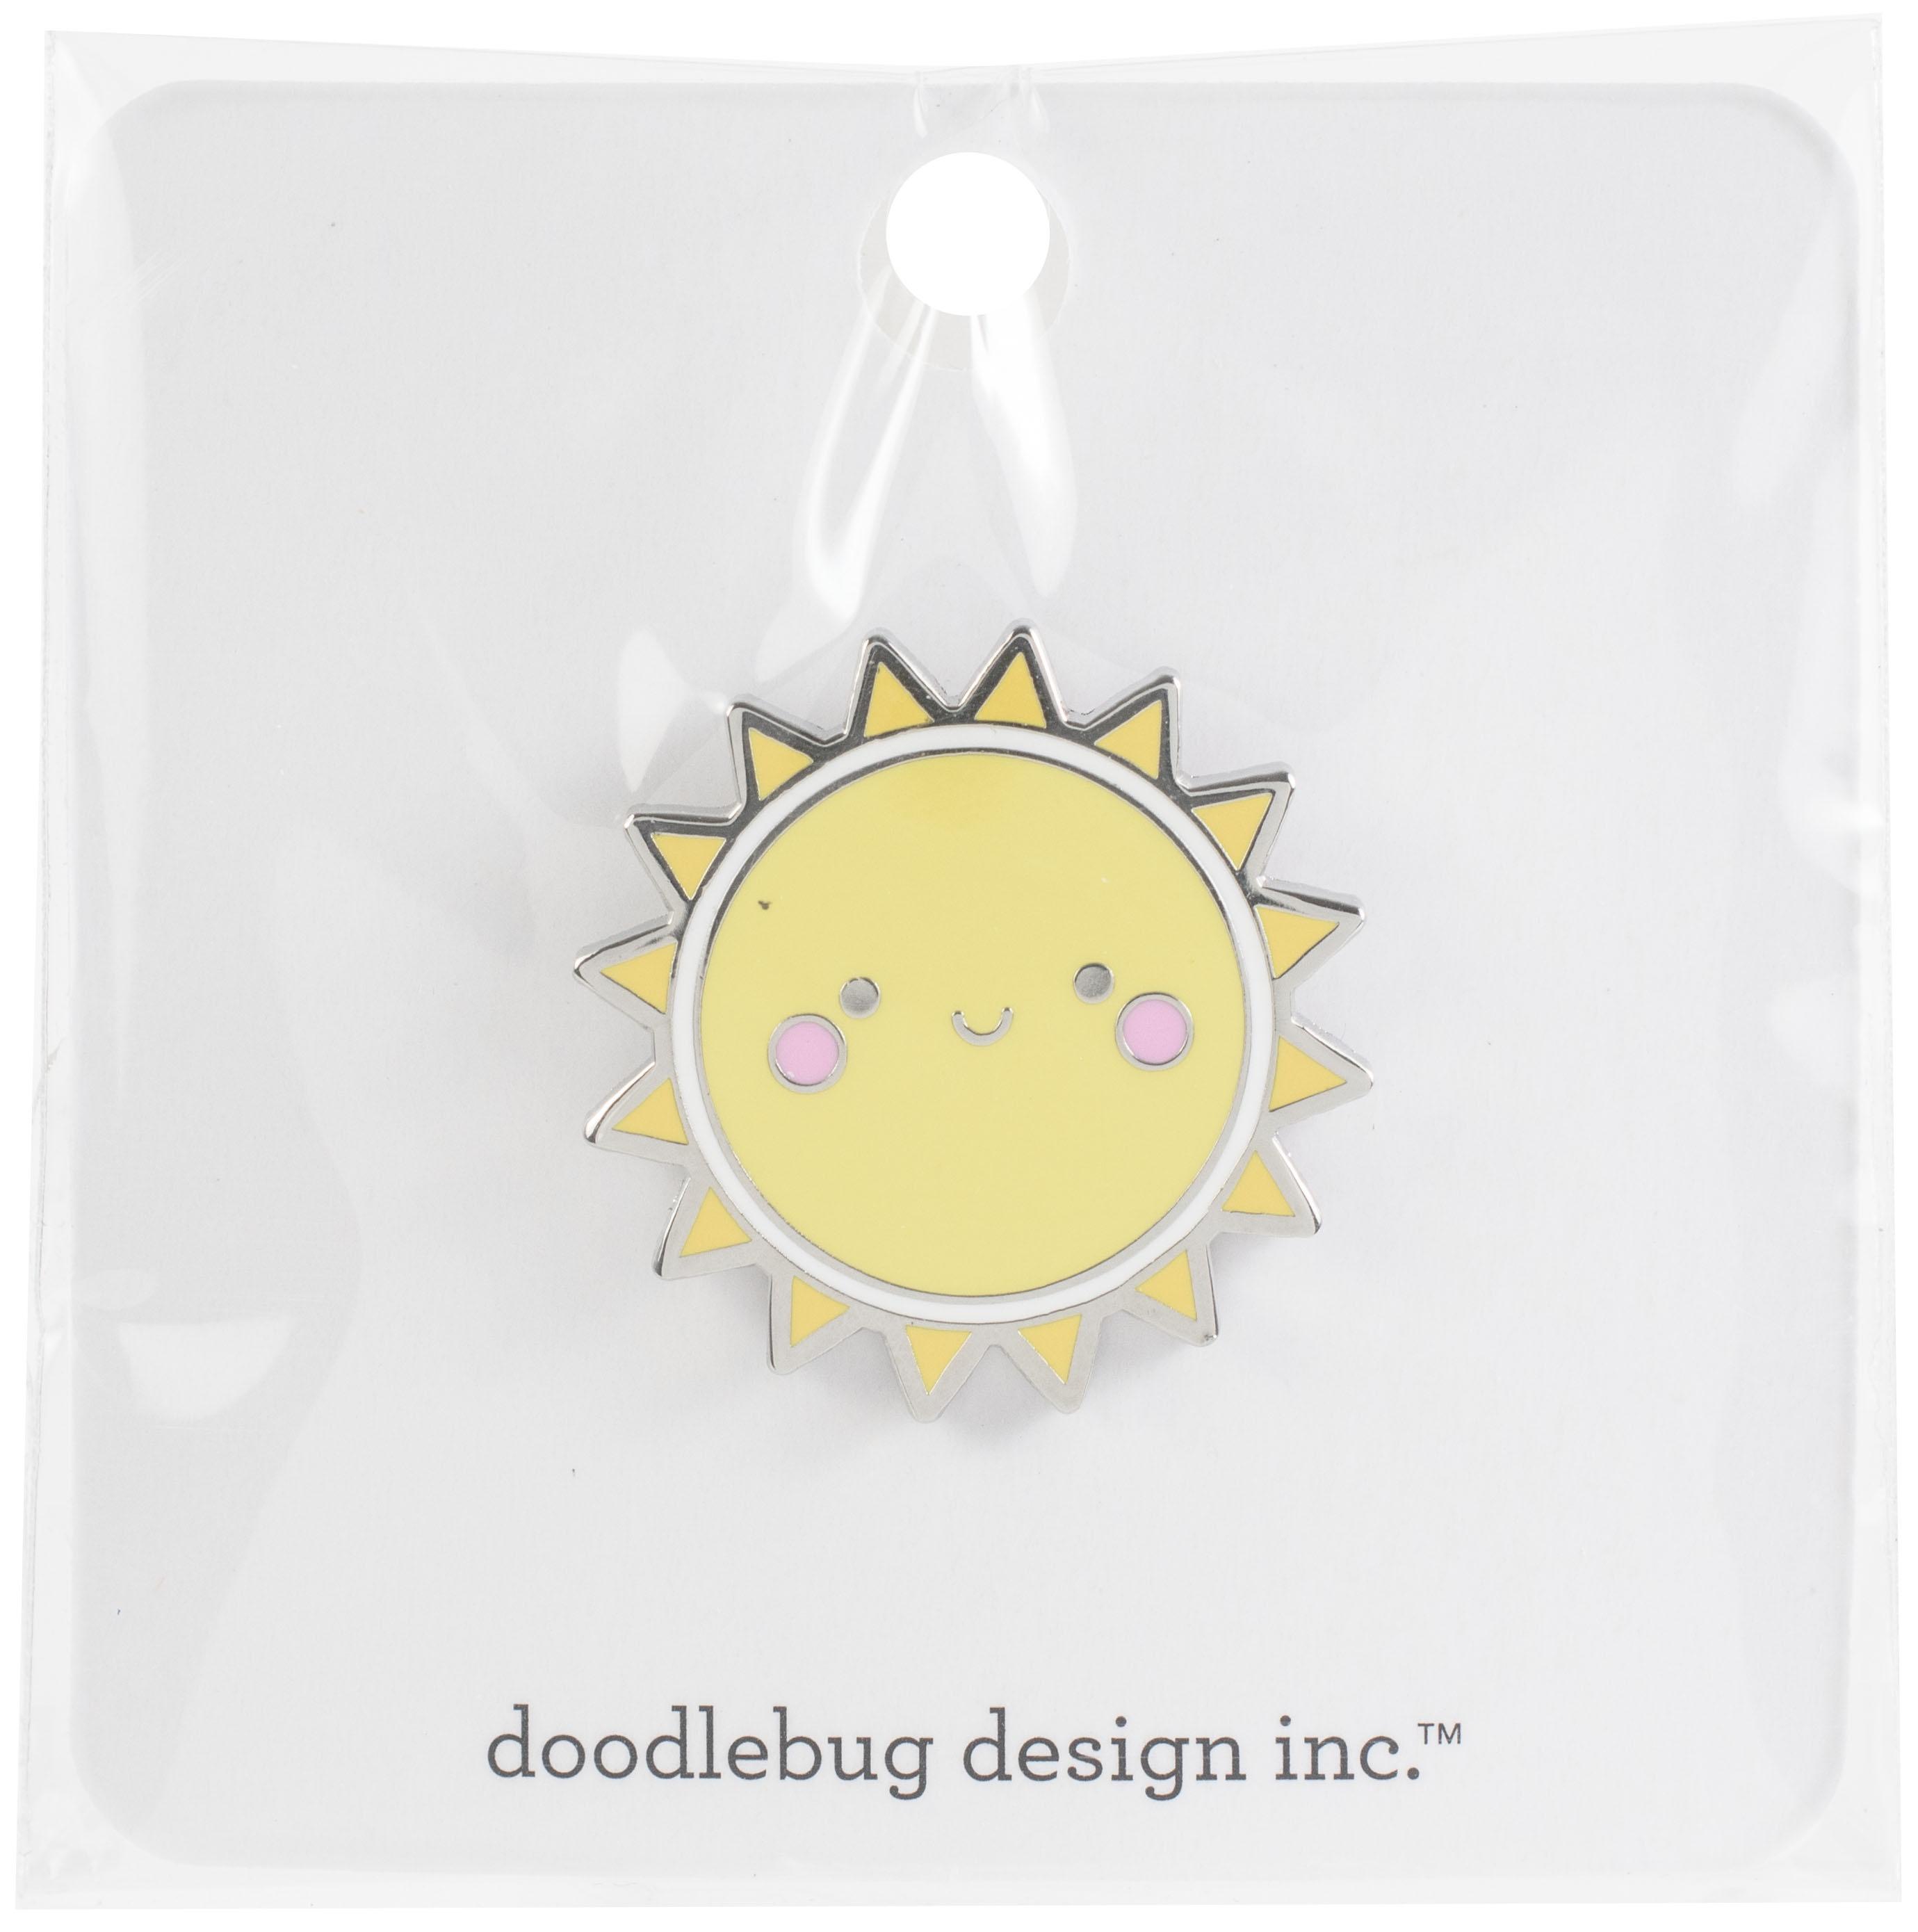 Bundle of Joy Sunshine Collectible Pin